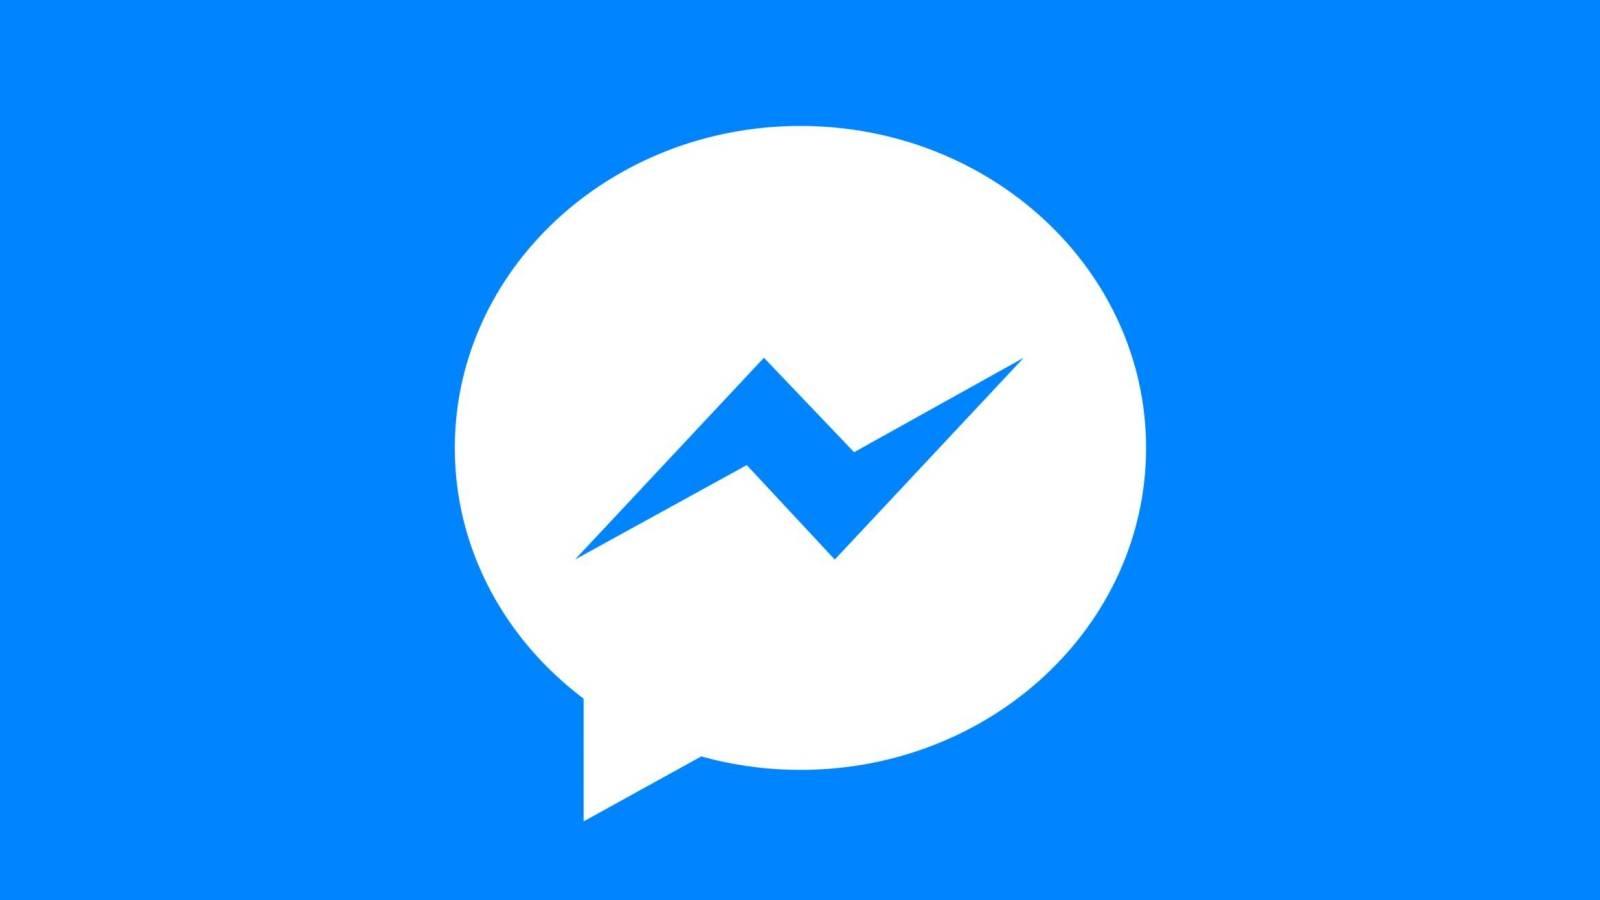 Facebook Messenger: Noua Actualizare, ce Schimbari sunt Oferite in Aplicatie thumbnail